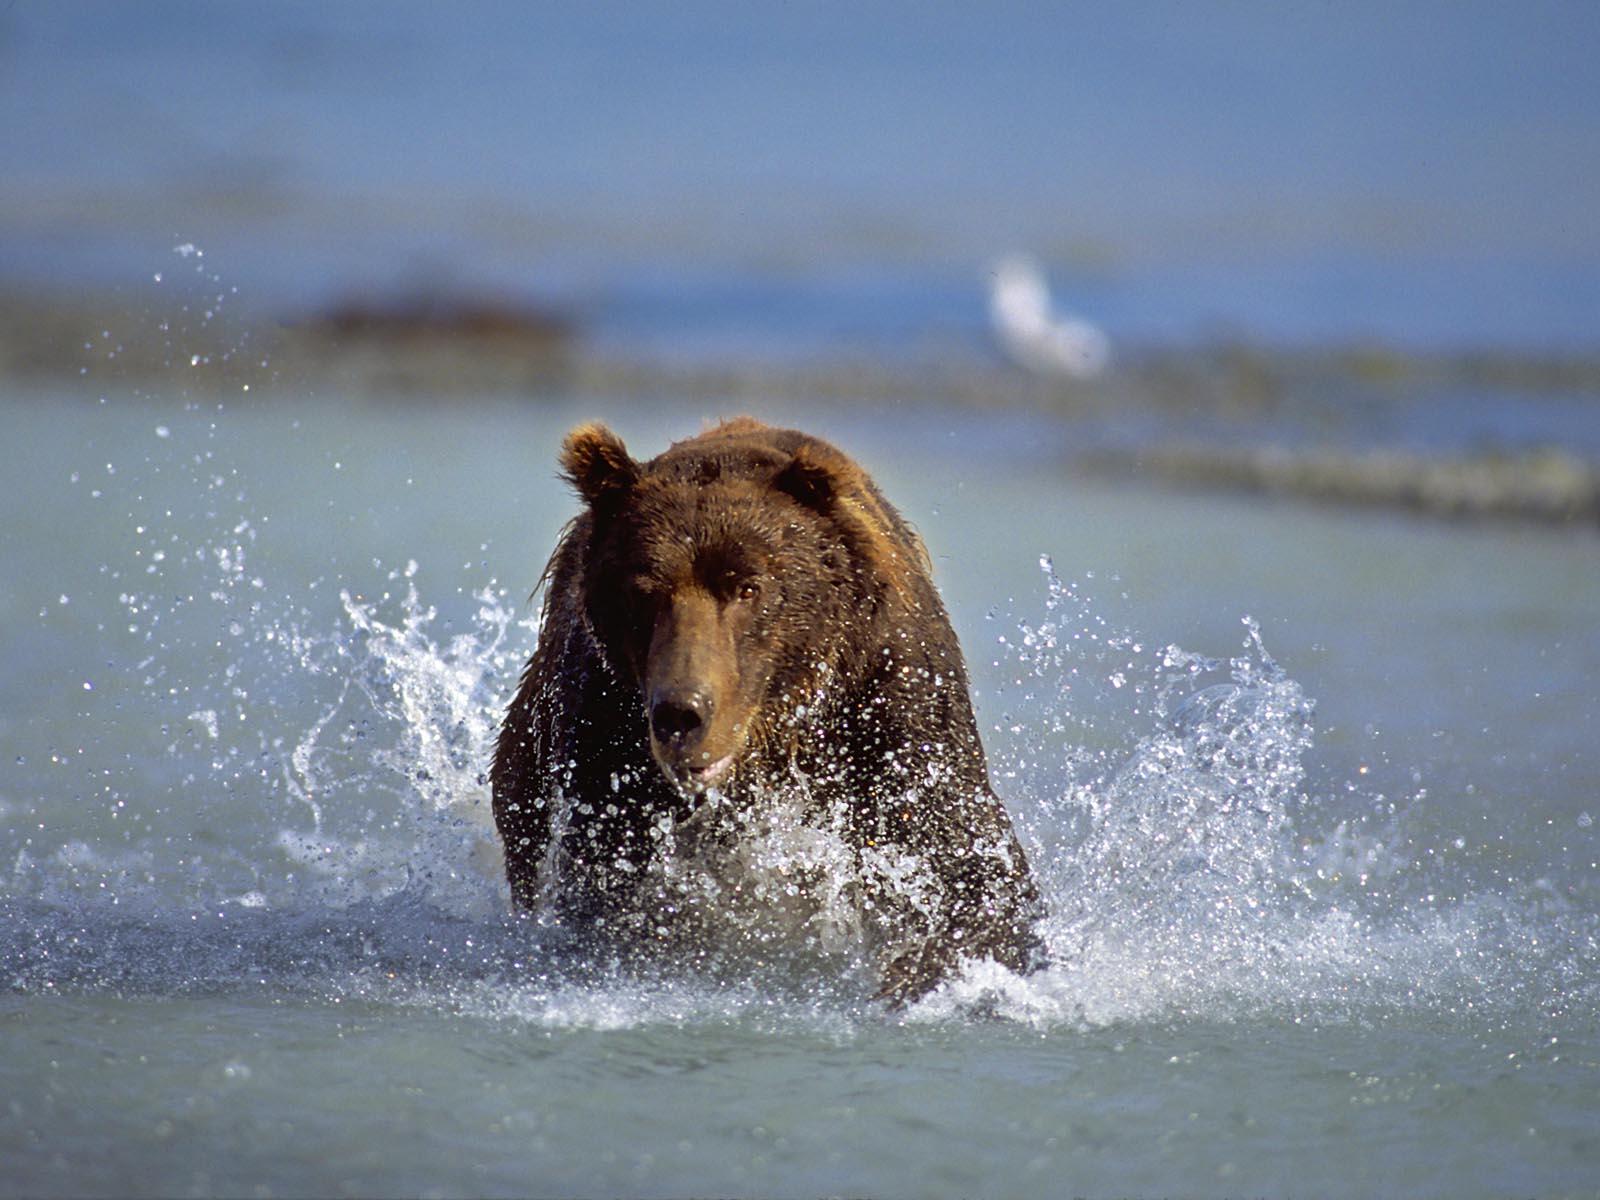 Chasing a salmon